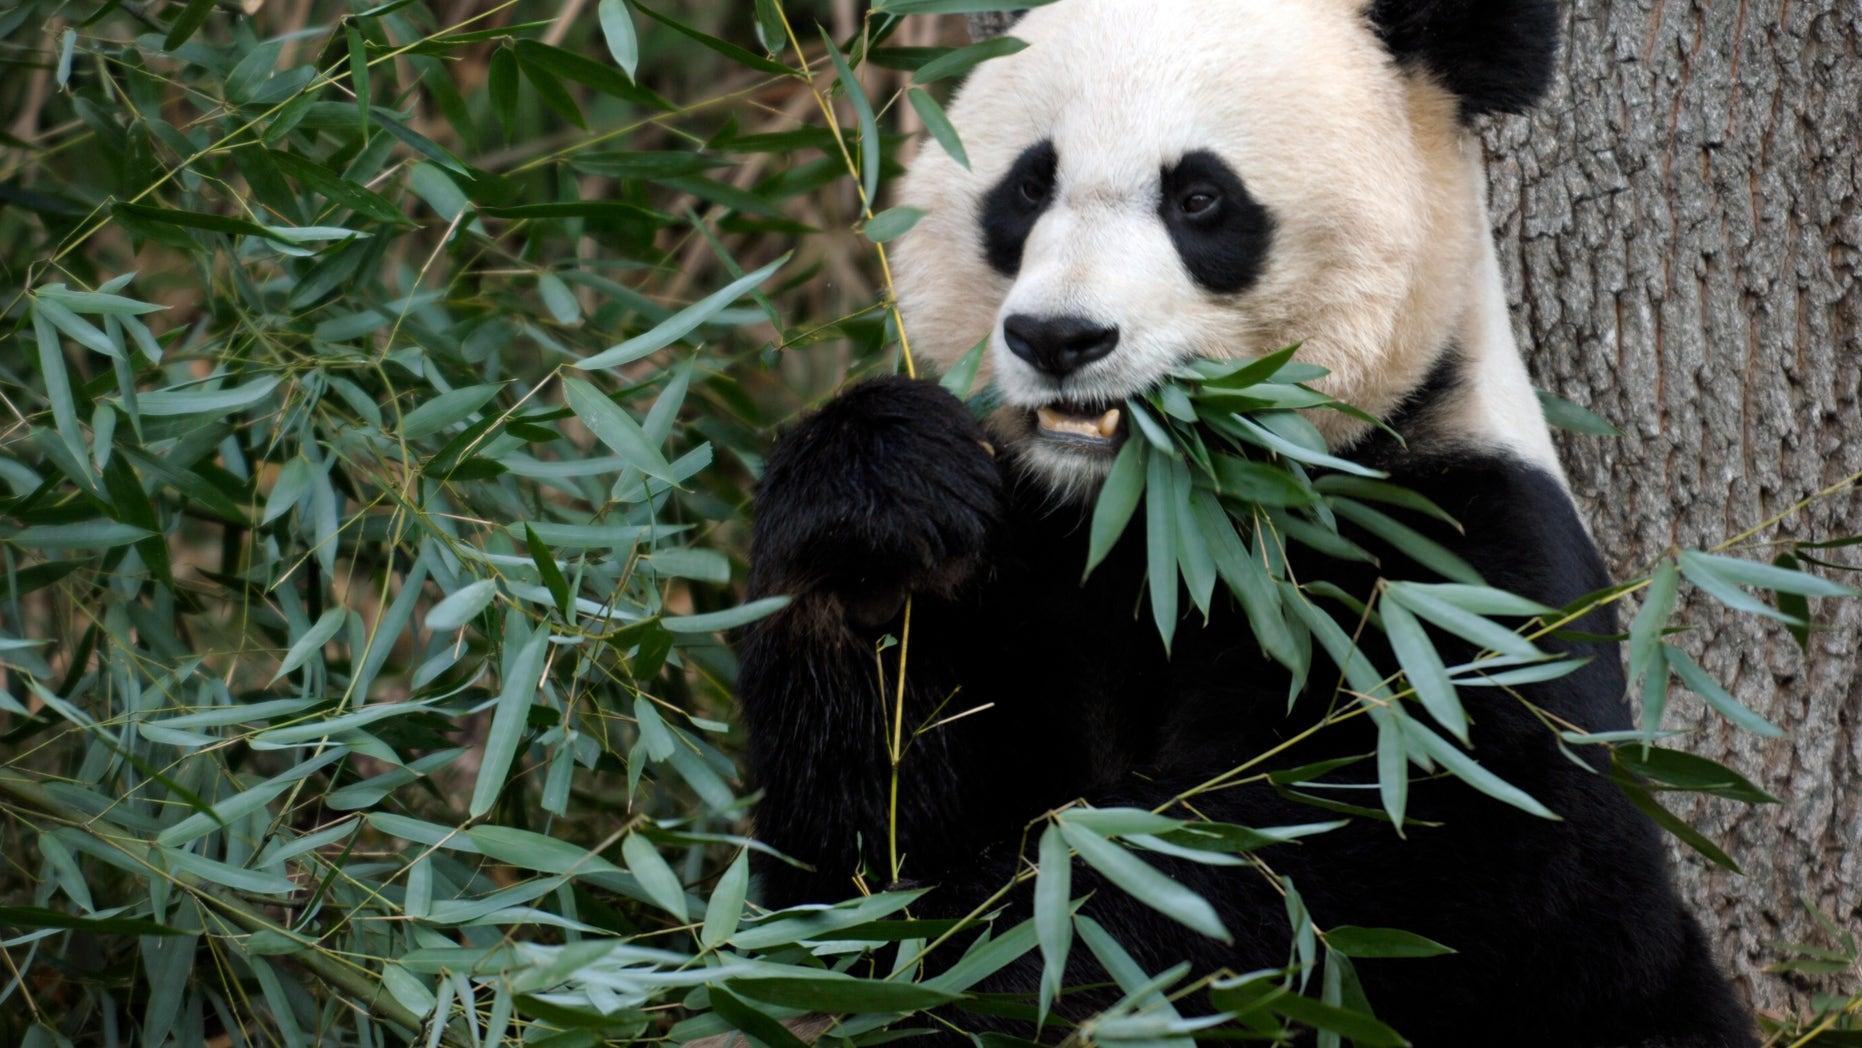 Dec. 19, 2011: File photo shows Mei Xiang, the female giant panda at the Smithsonian's National Zoo in Washington.